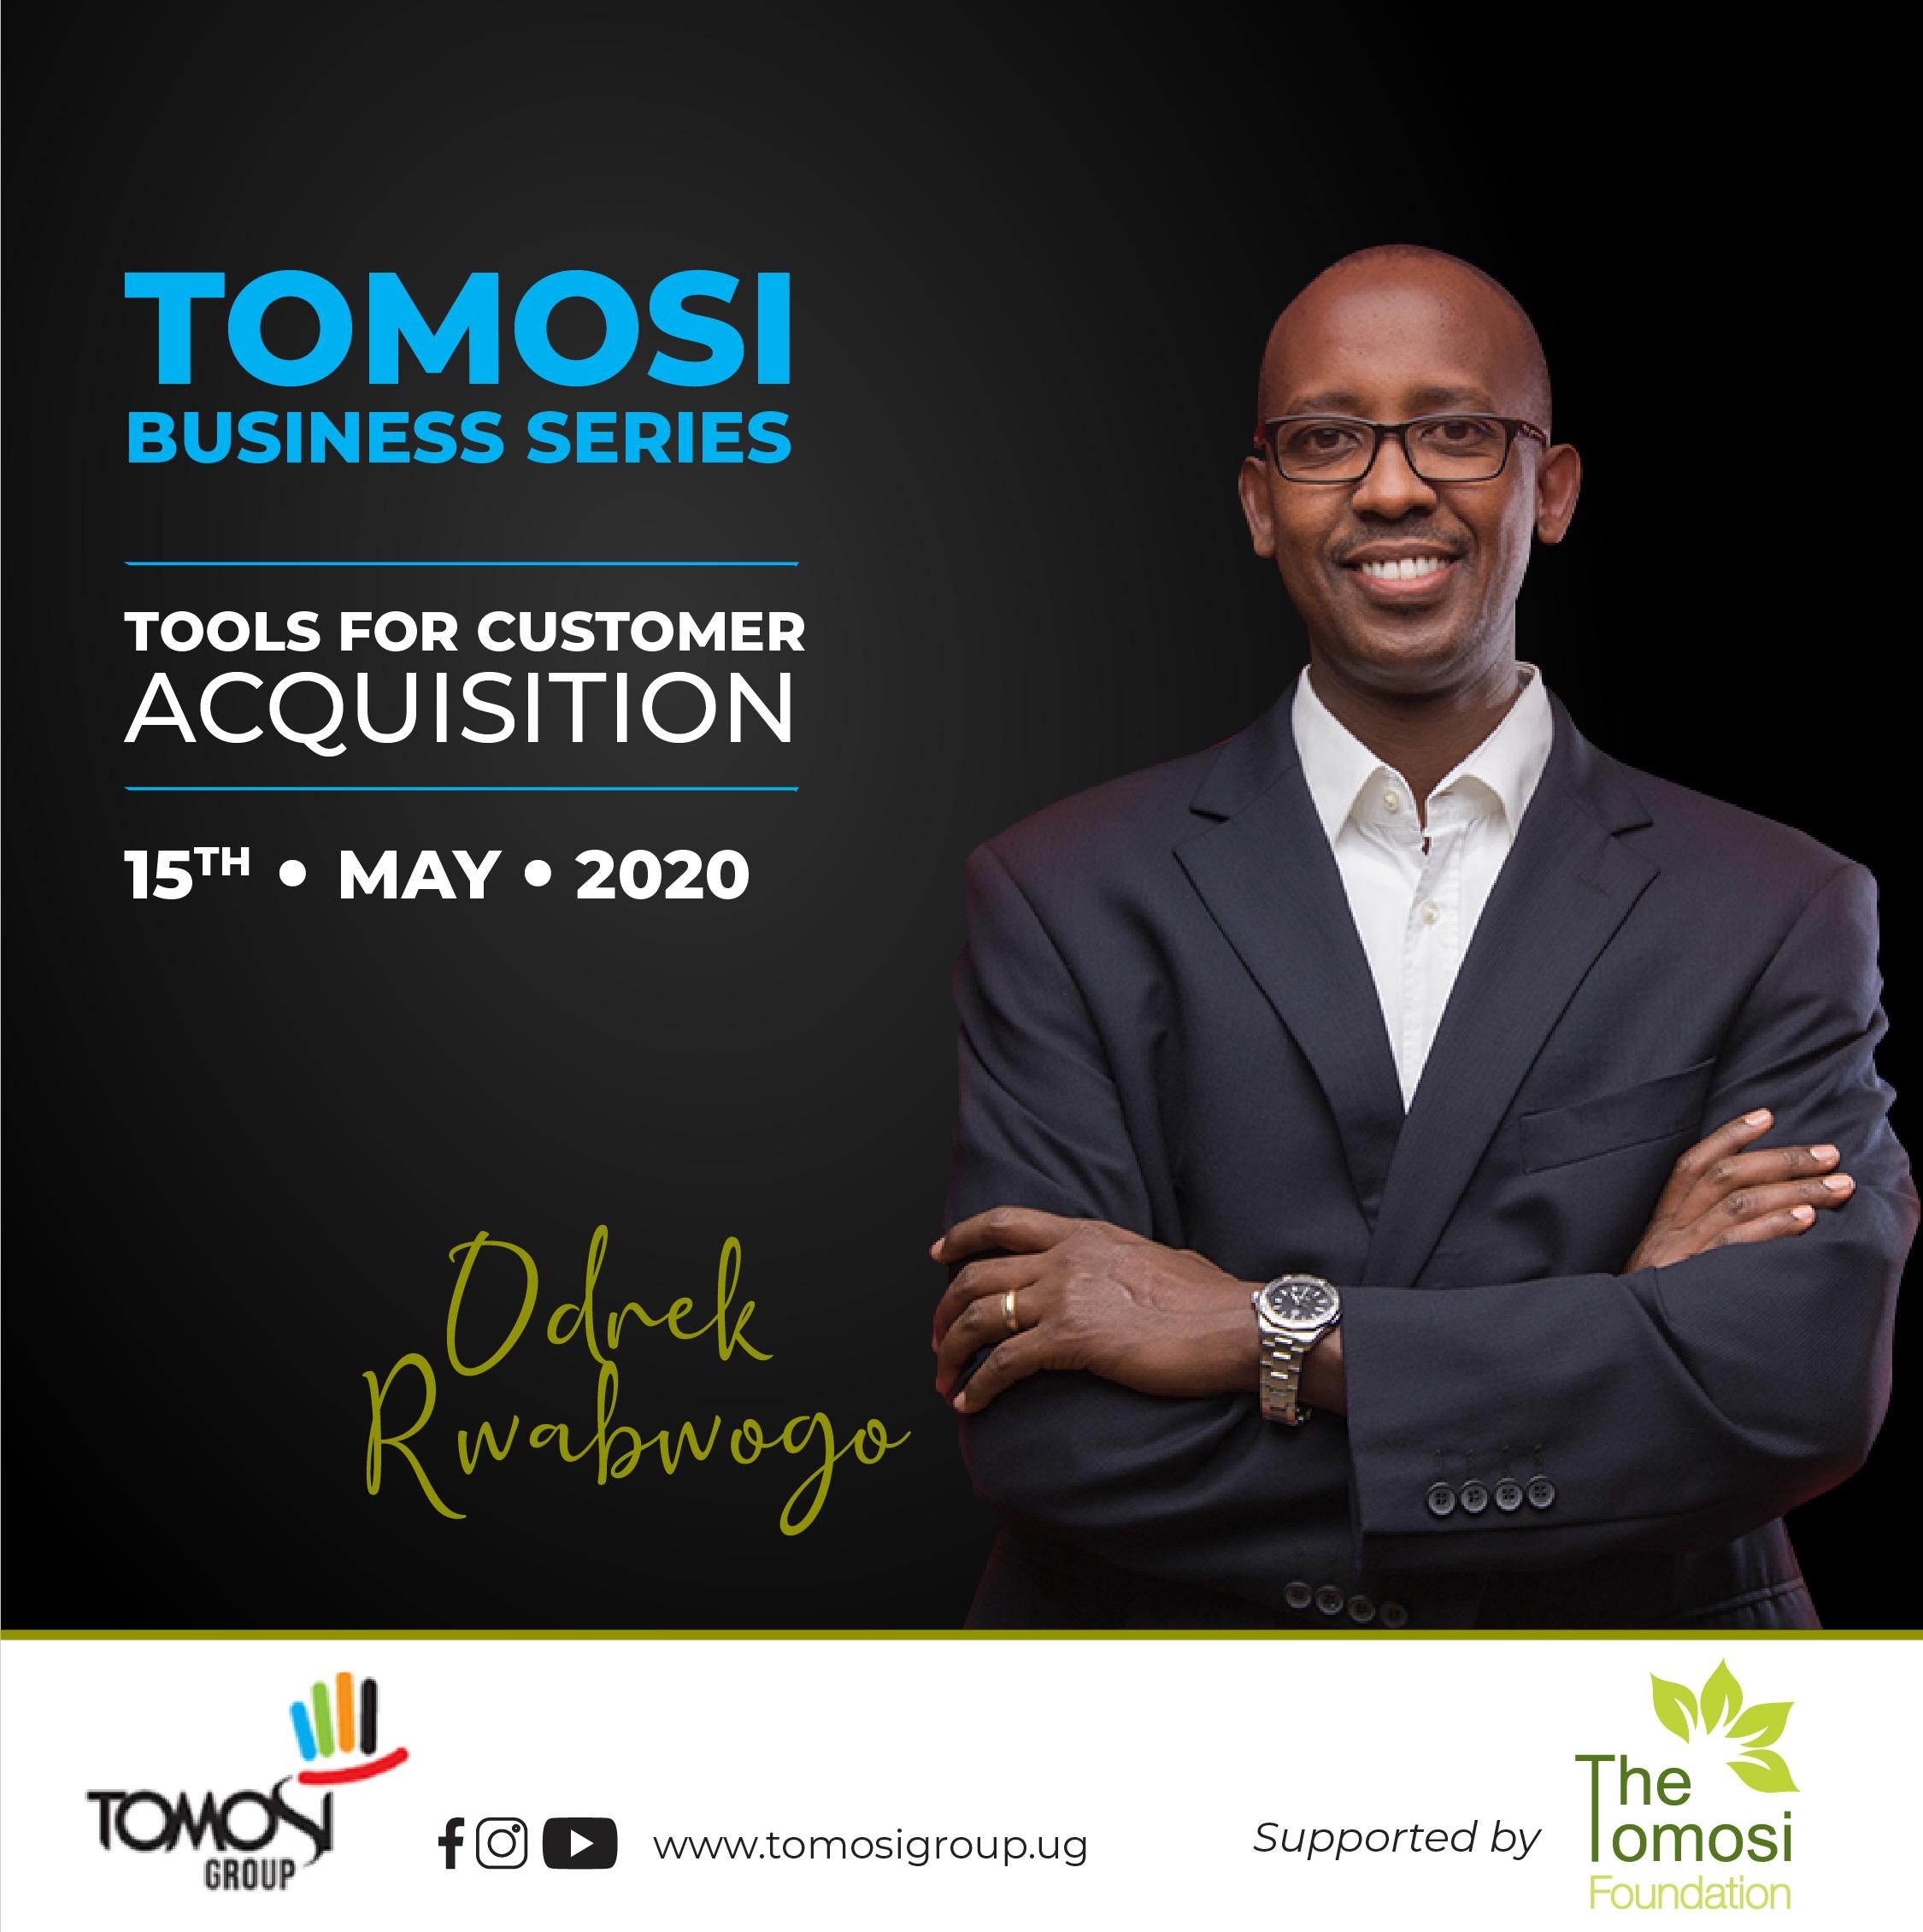 Tomosi Business Series upcoming training